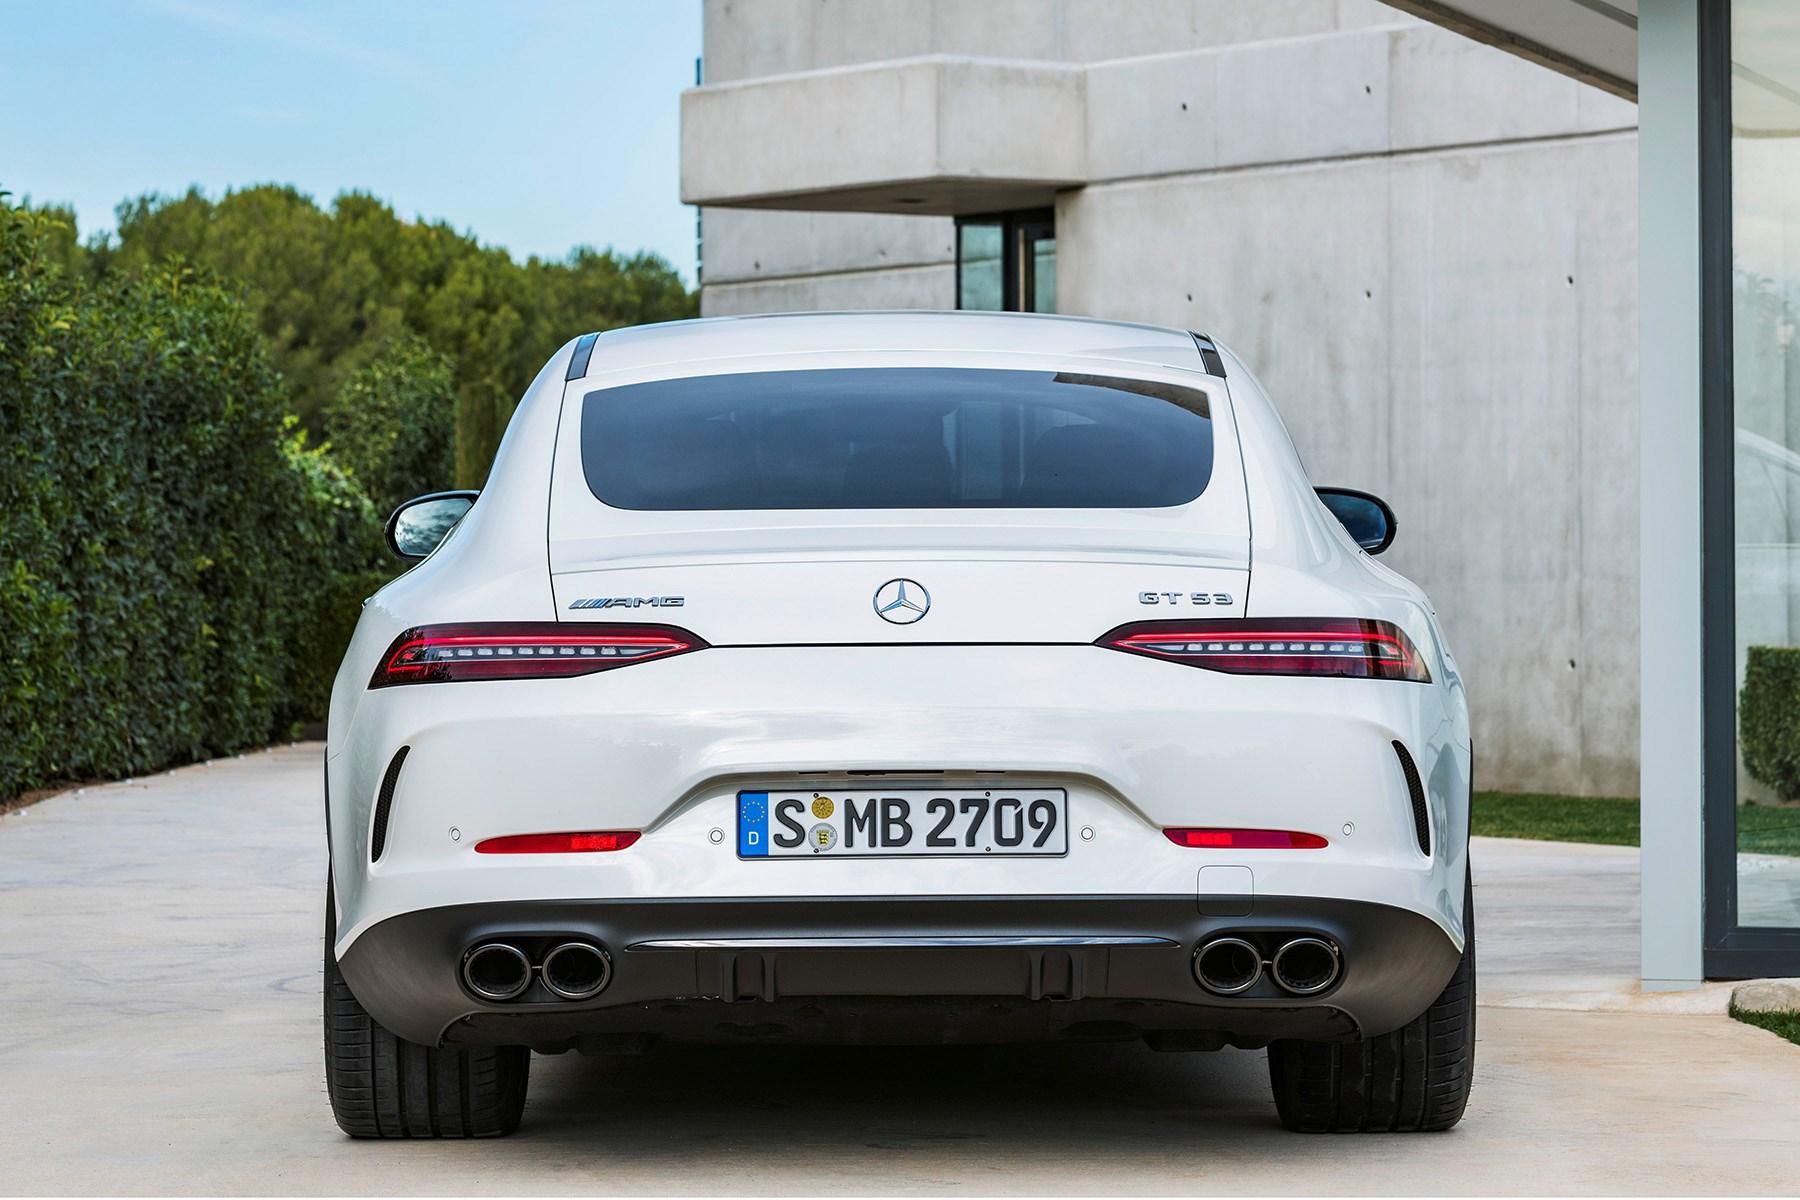 Mercedes Amg Gt 4 Door First Ride Impressions Car Magazine